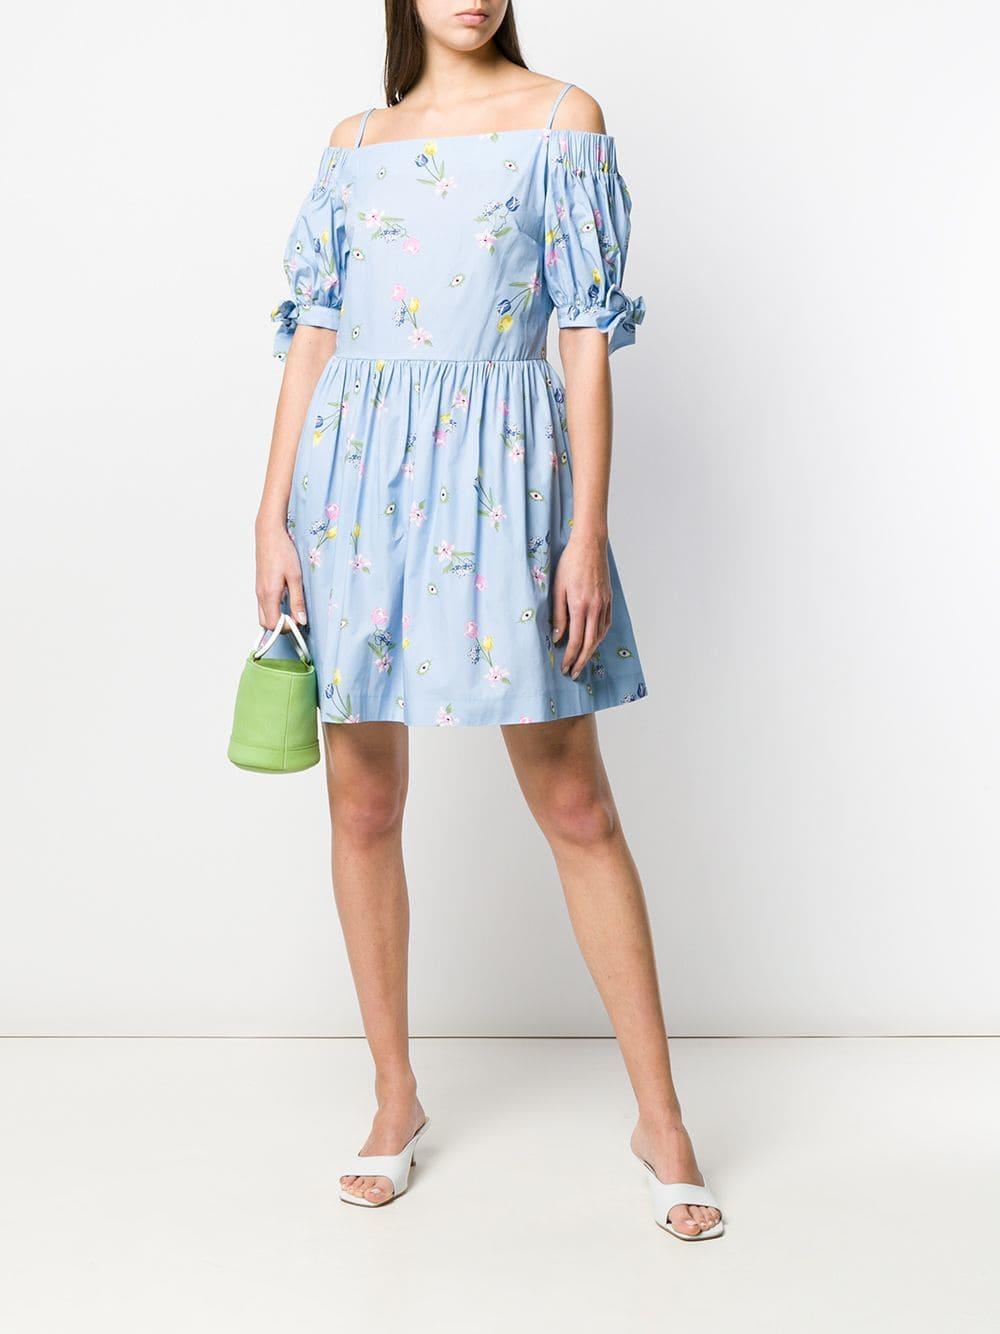 8d18ec8b697 Lyst - Vivetta Off Shoulder Floral Print Dress in Blue